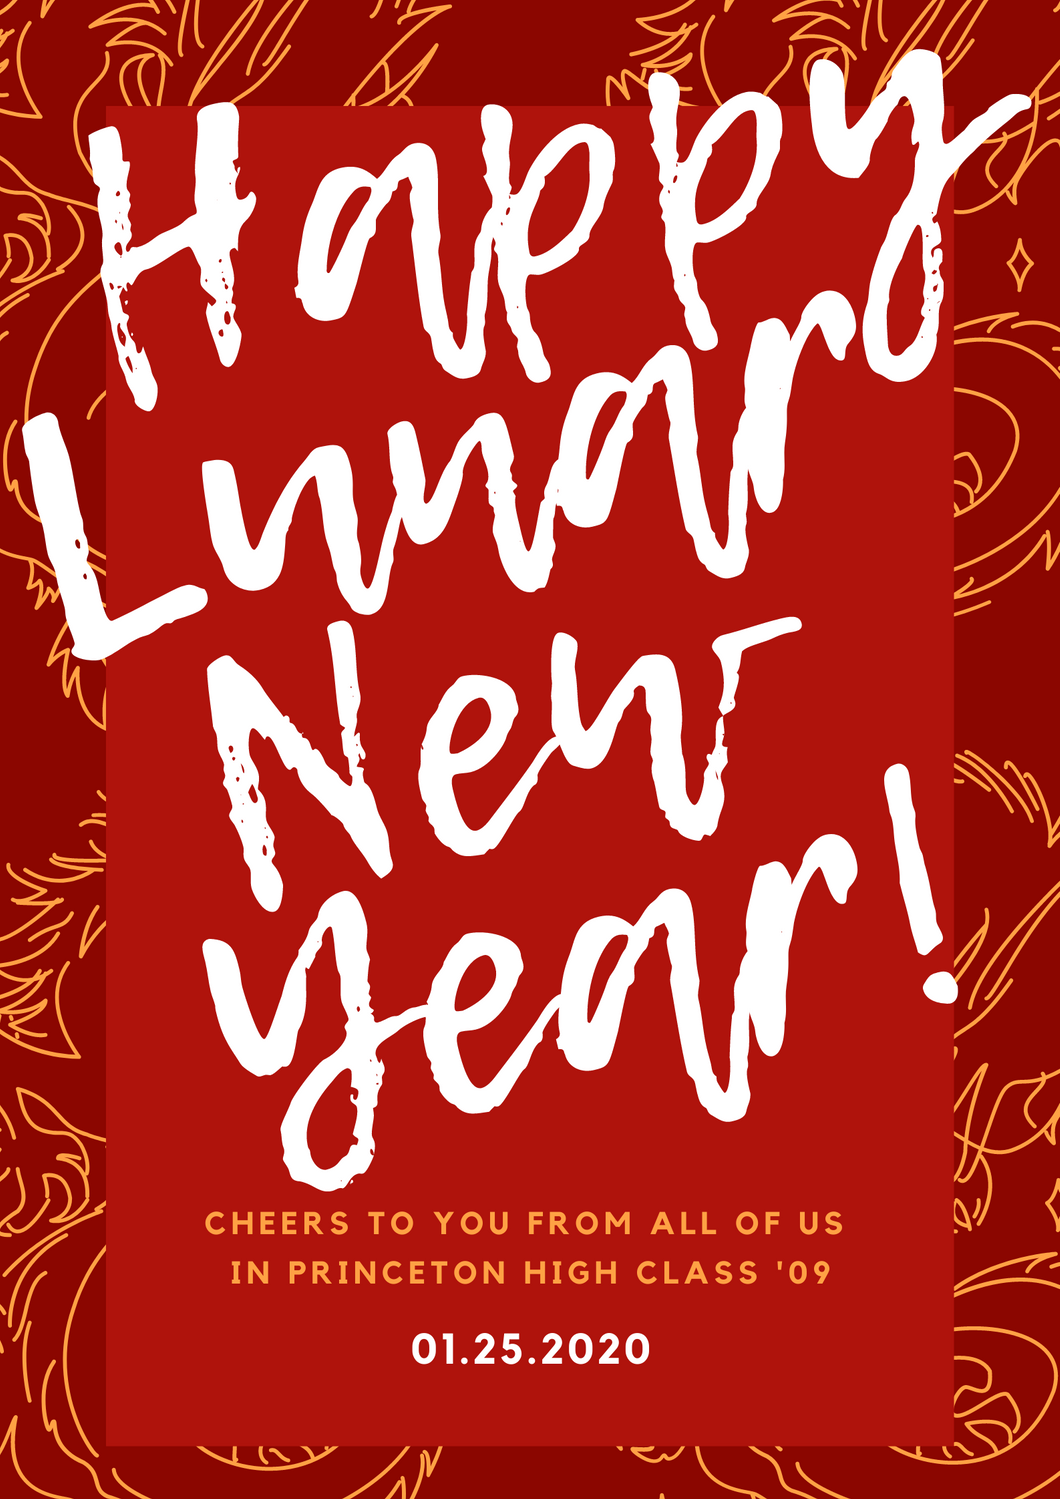 Lunisolar Calendar 2022.Happy New Year 2022 Lunisolar Calendar Joy And Happiness Cards